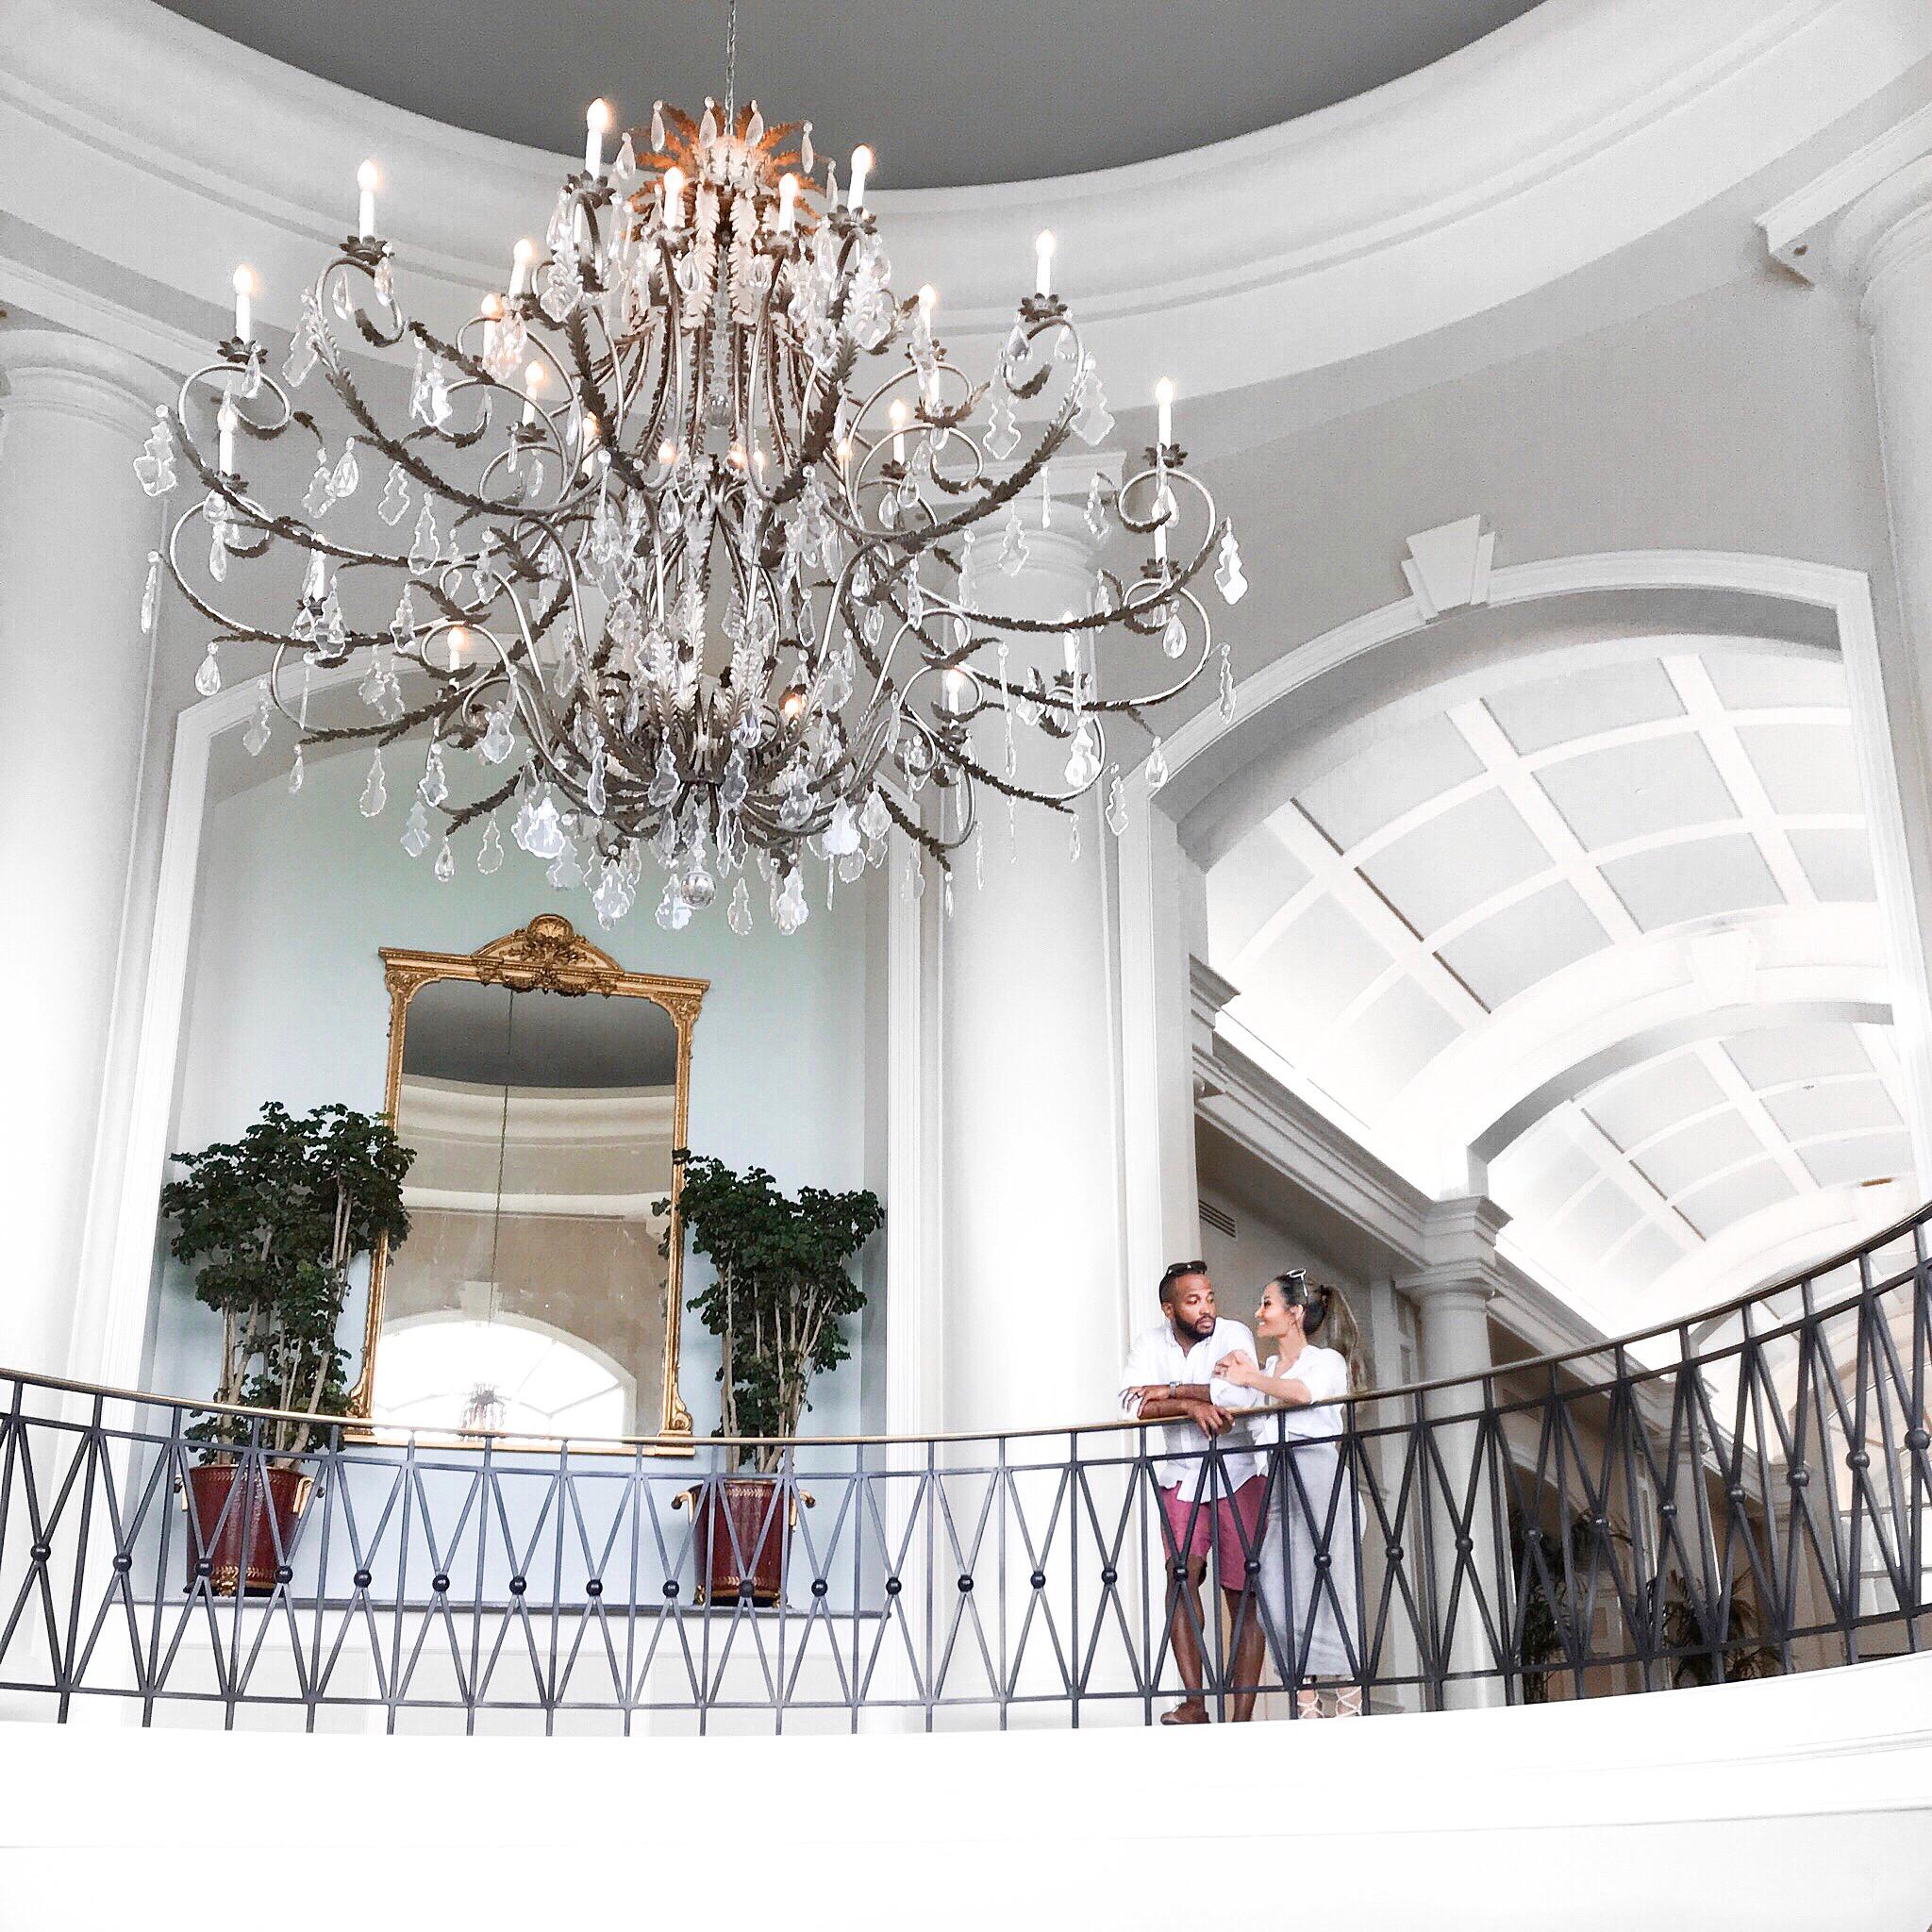 Ballantyne Hotel, Ballantyne Resort and spa, Ballantyne Hotel Charlotte, Ballantyne Hotel Lobby